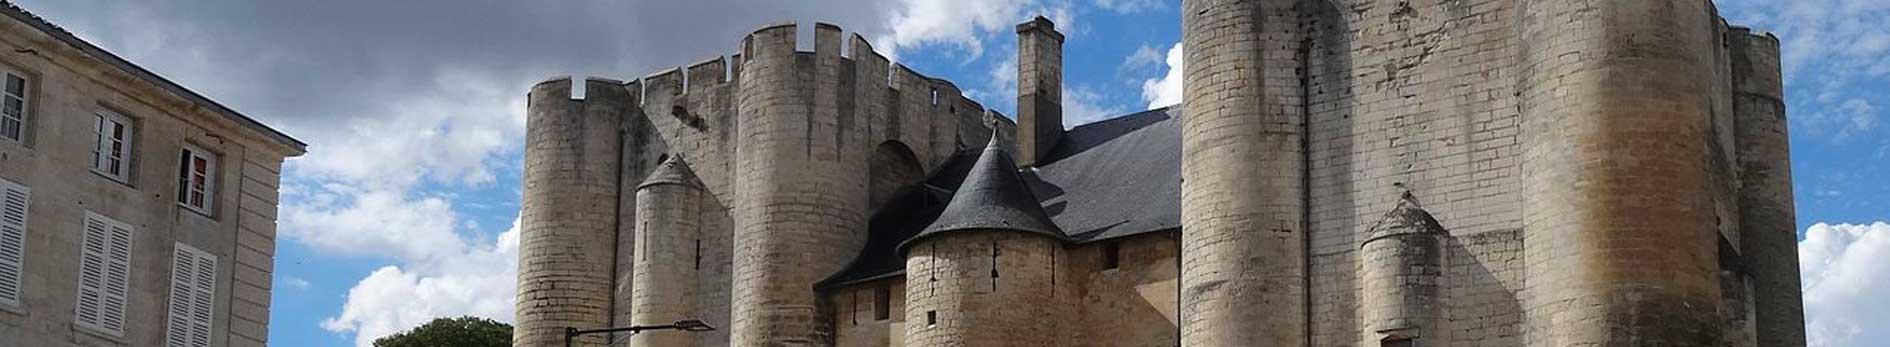 musée du donjon niort